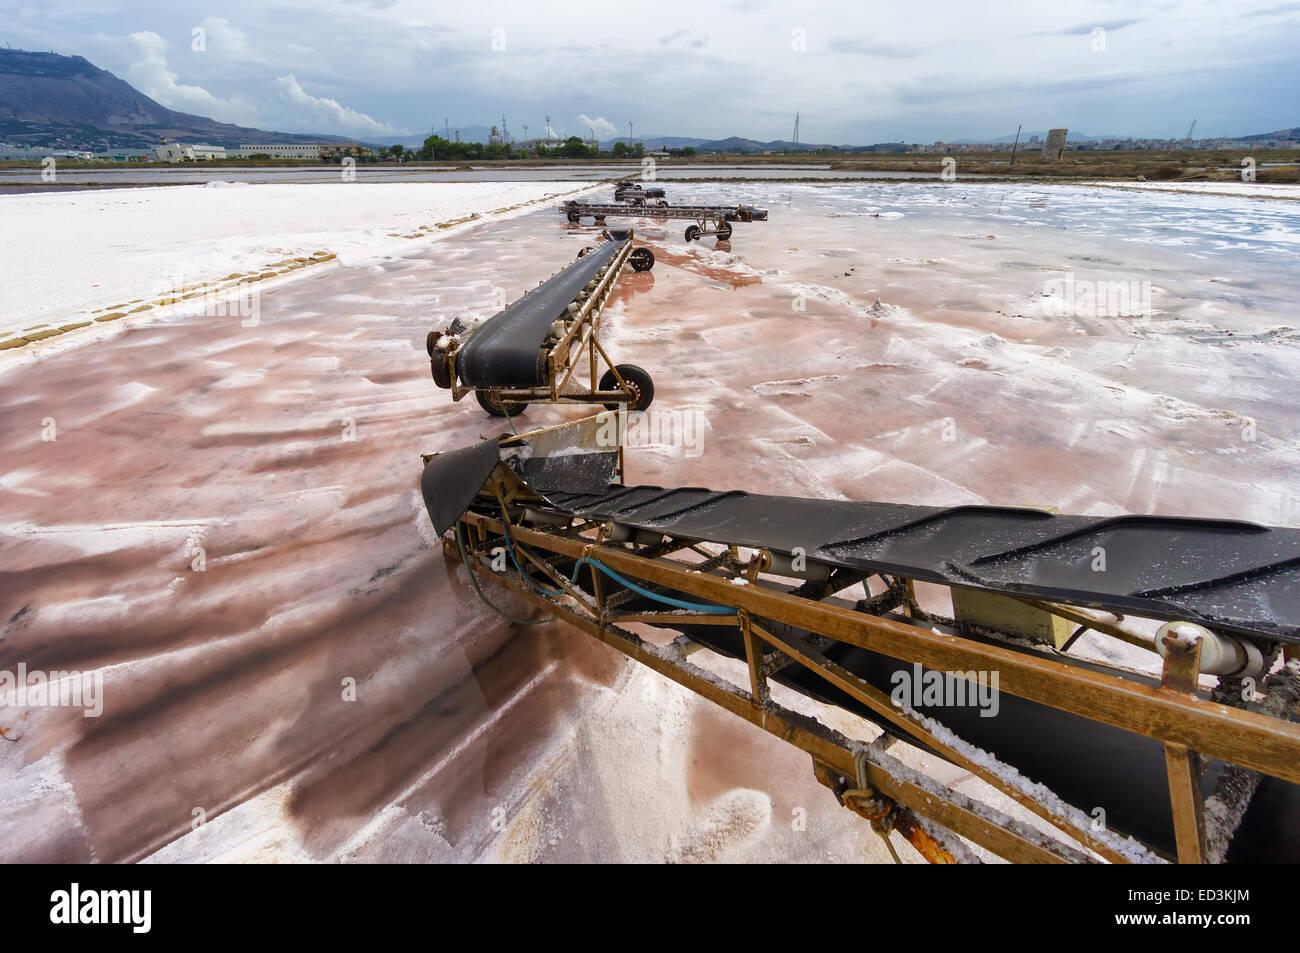 Sicily: conveyor belt on salt pan in Trapani, Italy - Stock Image